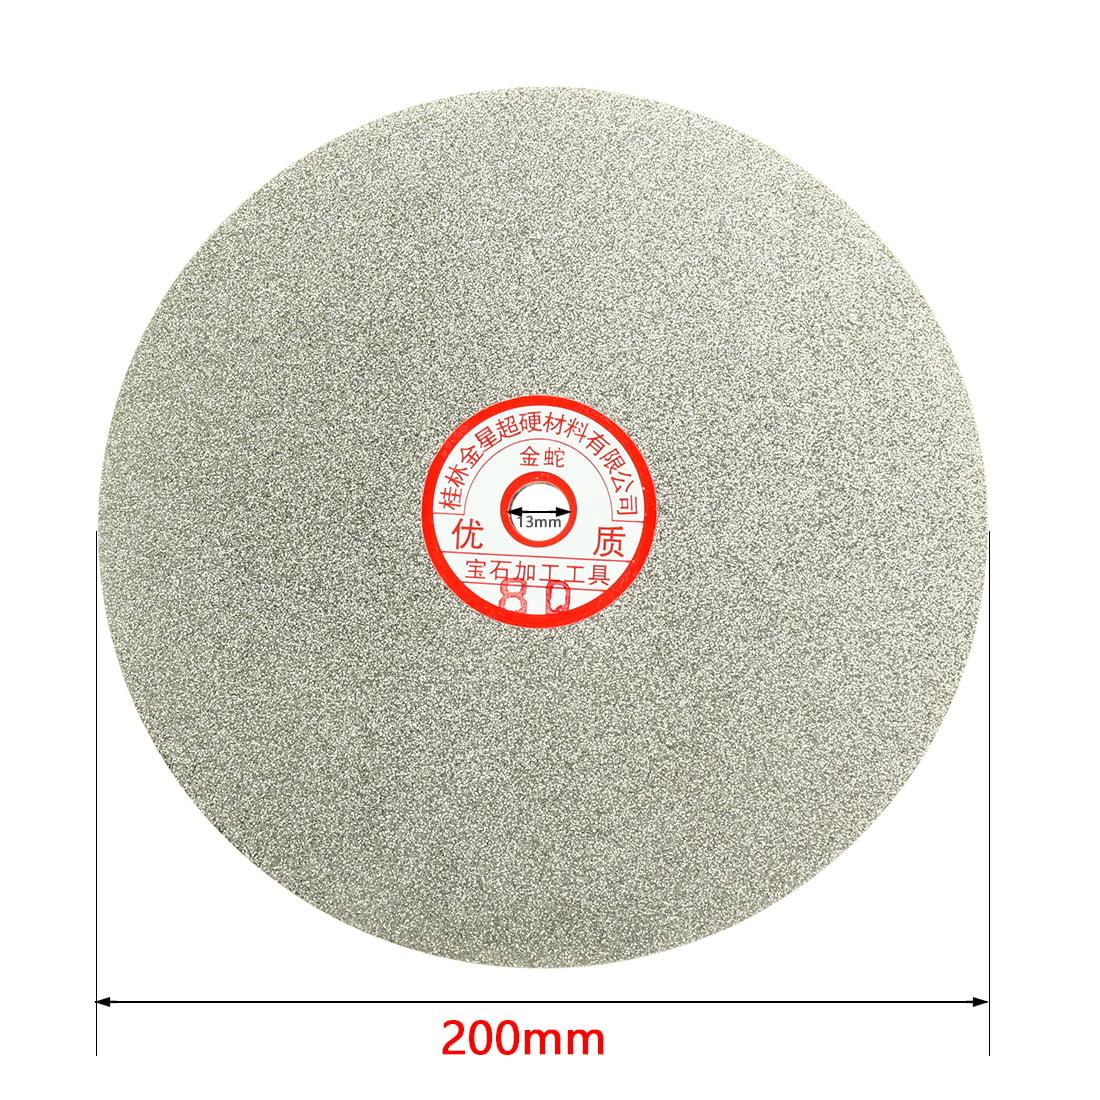 YaeGarden 8 Inch Grit 100 Diamond Coated Flat Lap Wheel Grinding Sanding Polishing Disc for Jewelry Stone /& Granite Rock Glass